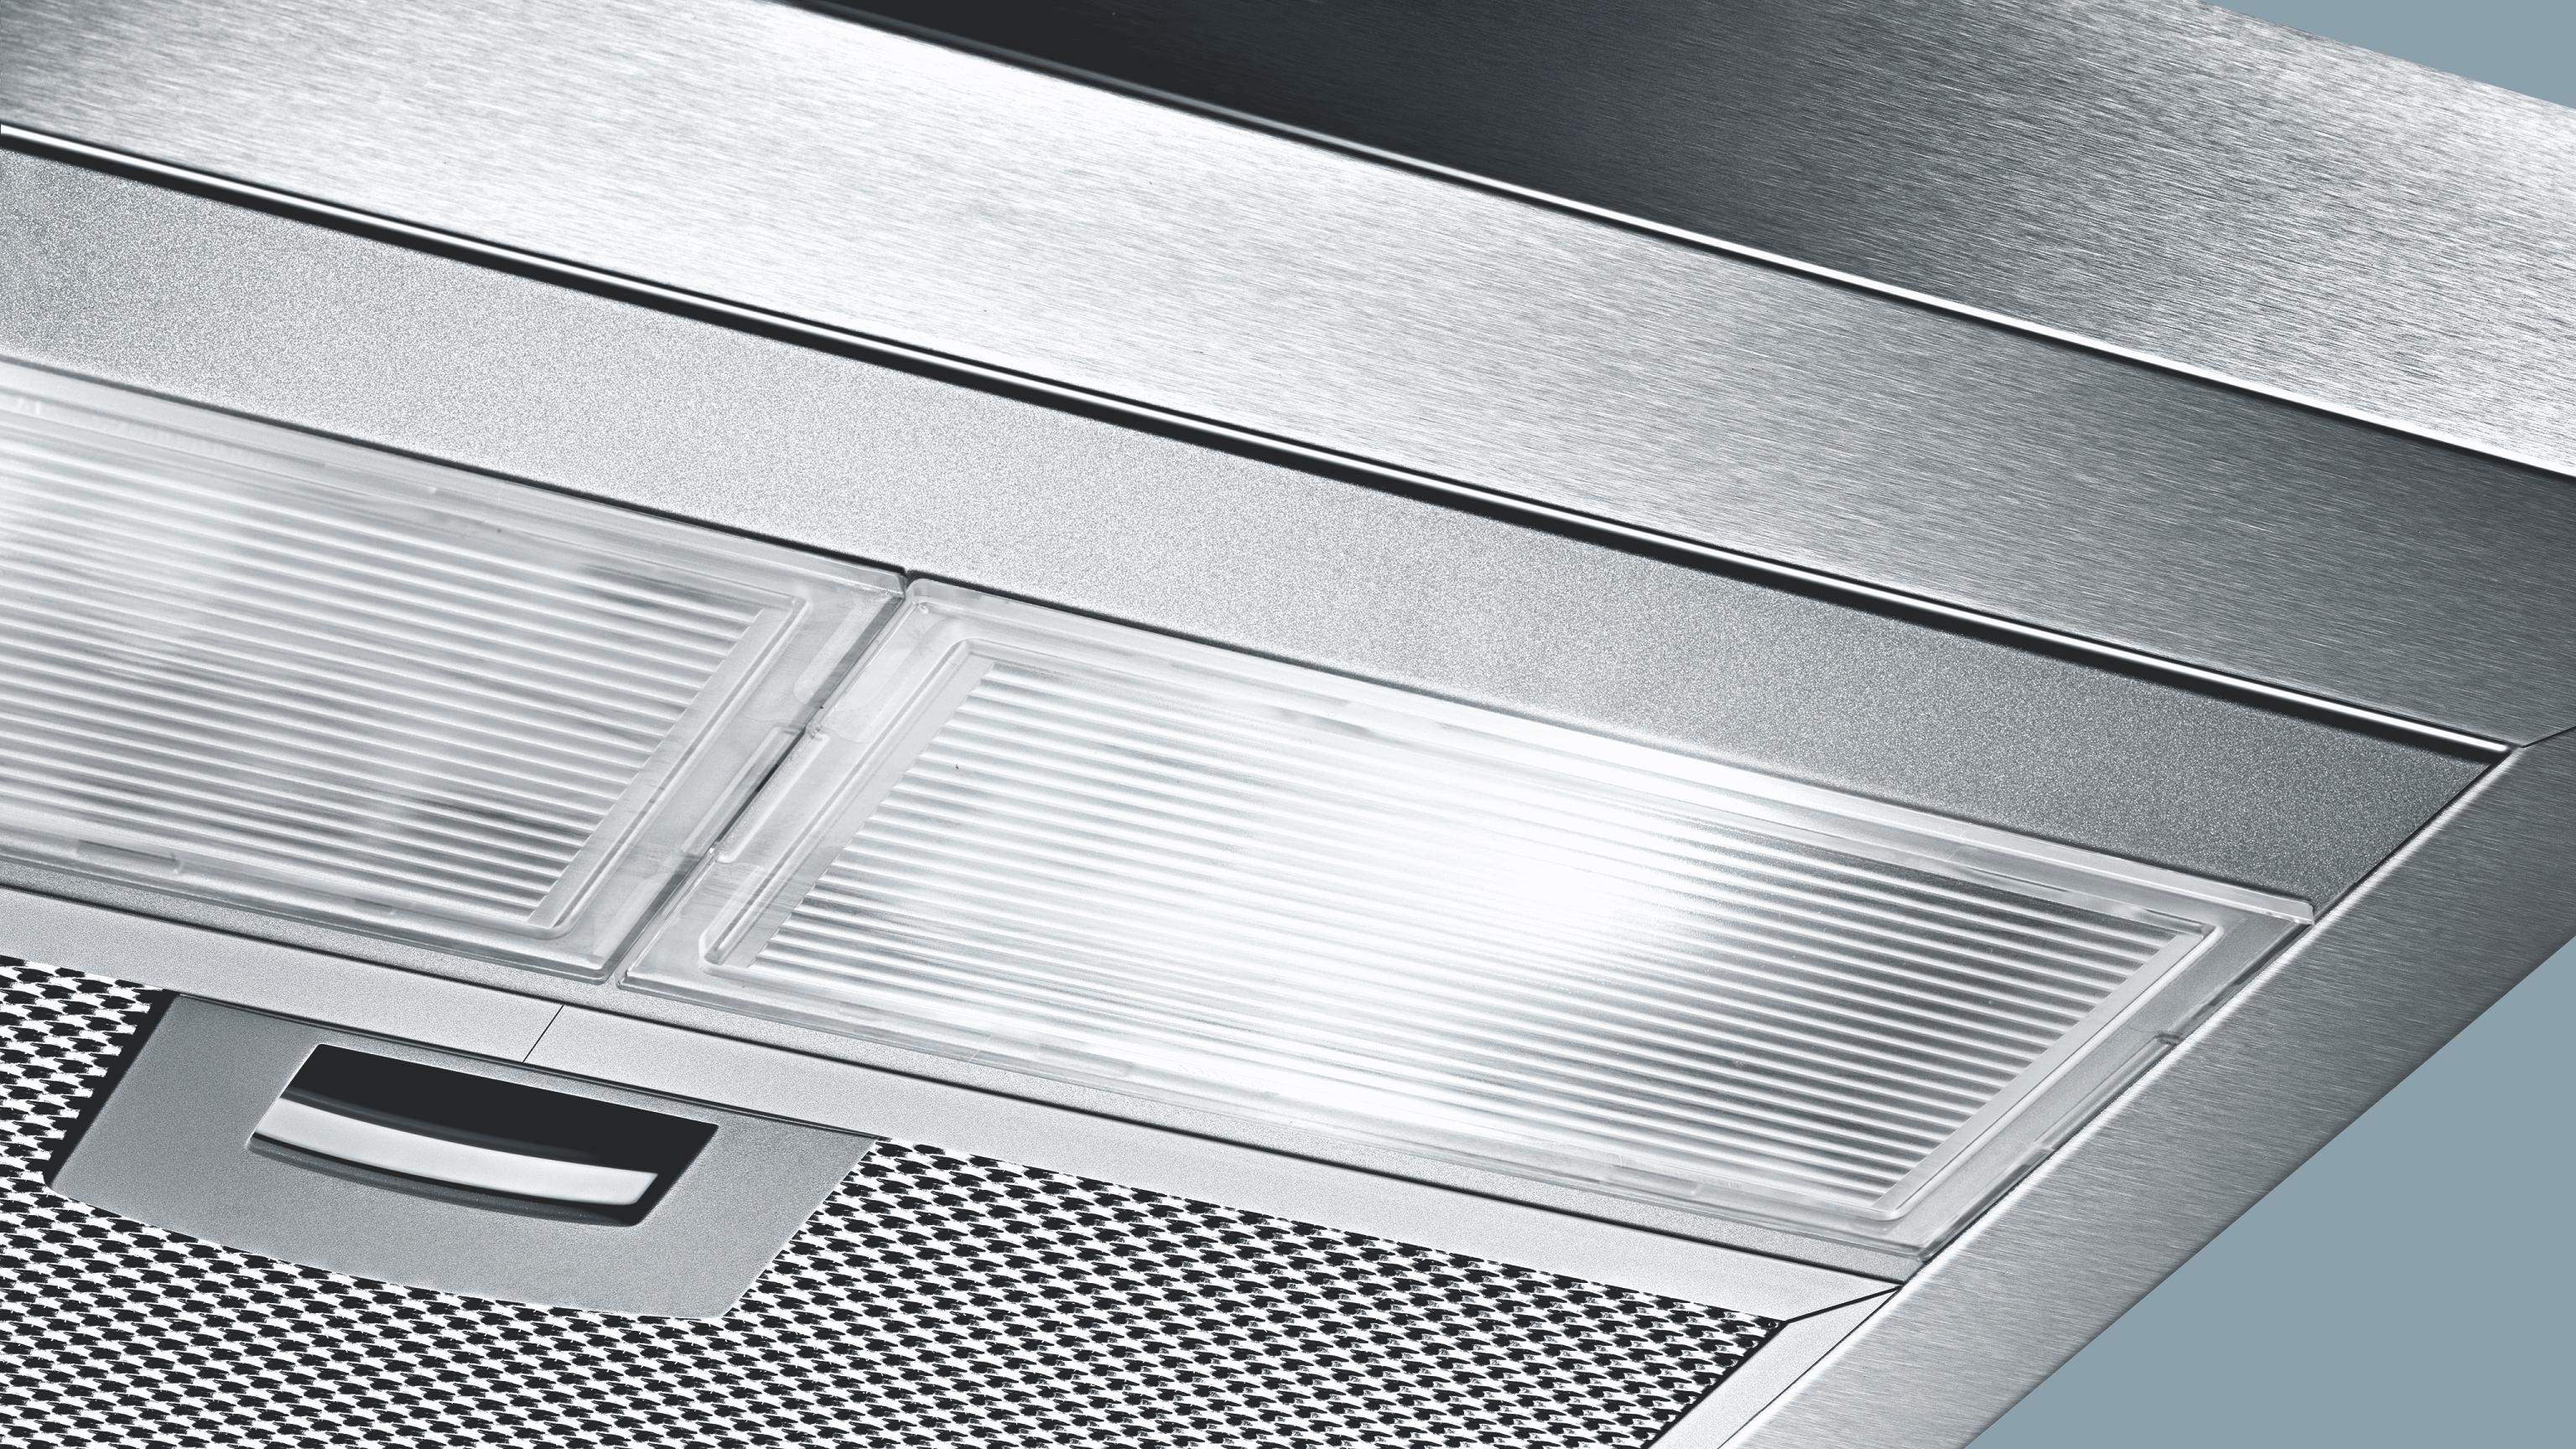 Dunstabzugshaube Siemens Lc64wa521, EEZ D - ROMANTIK / LANDHAUS, Metall (60/79,9-97,6/50cm) - SIEMENS